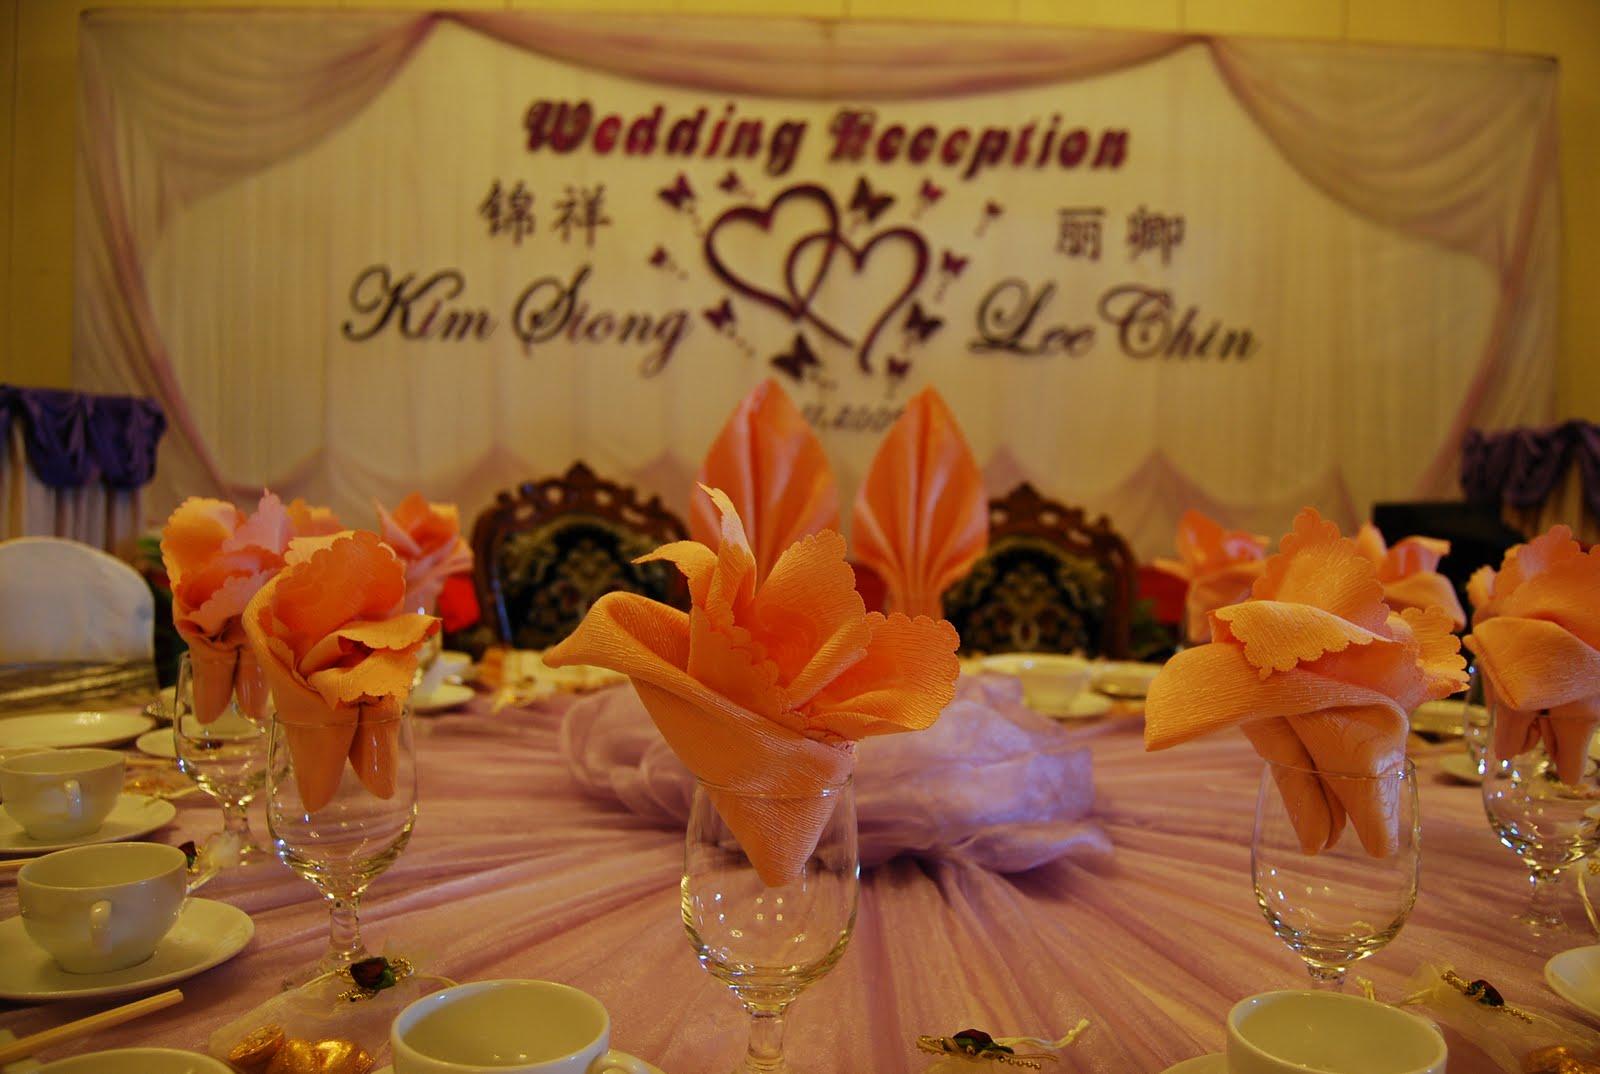 Wedding backdrop for Kim siong